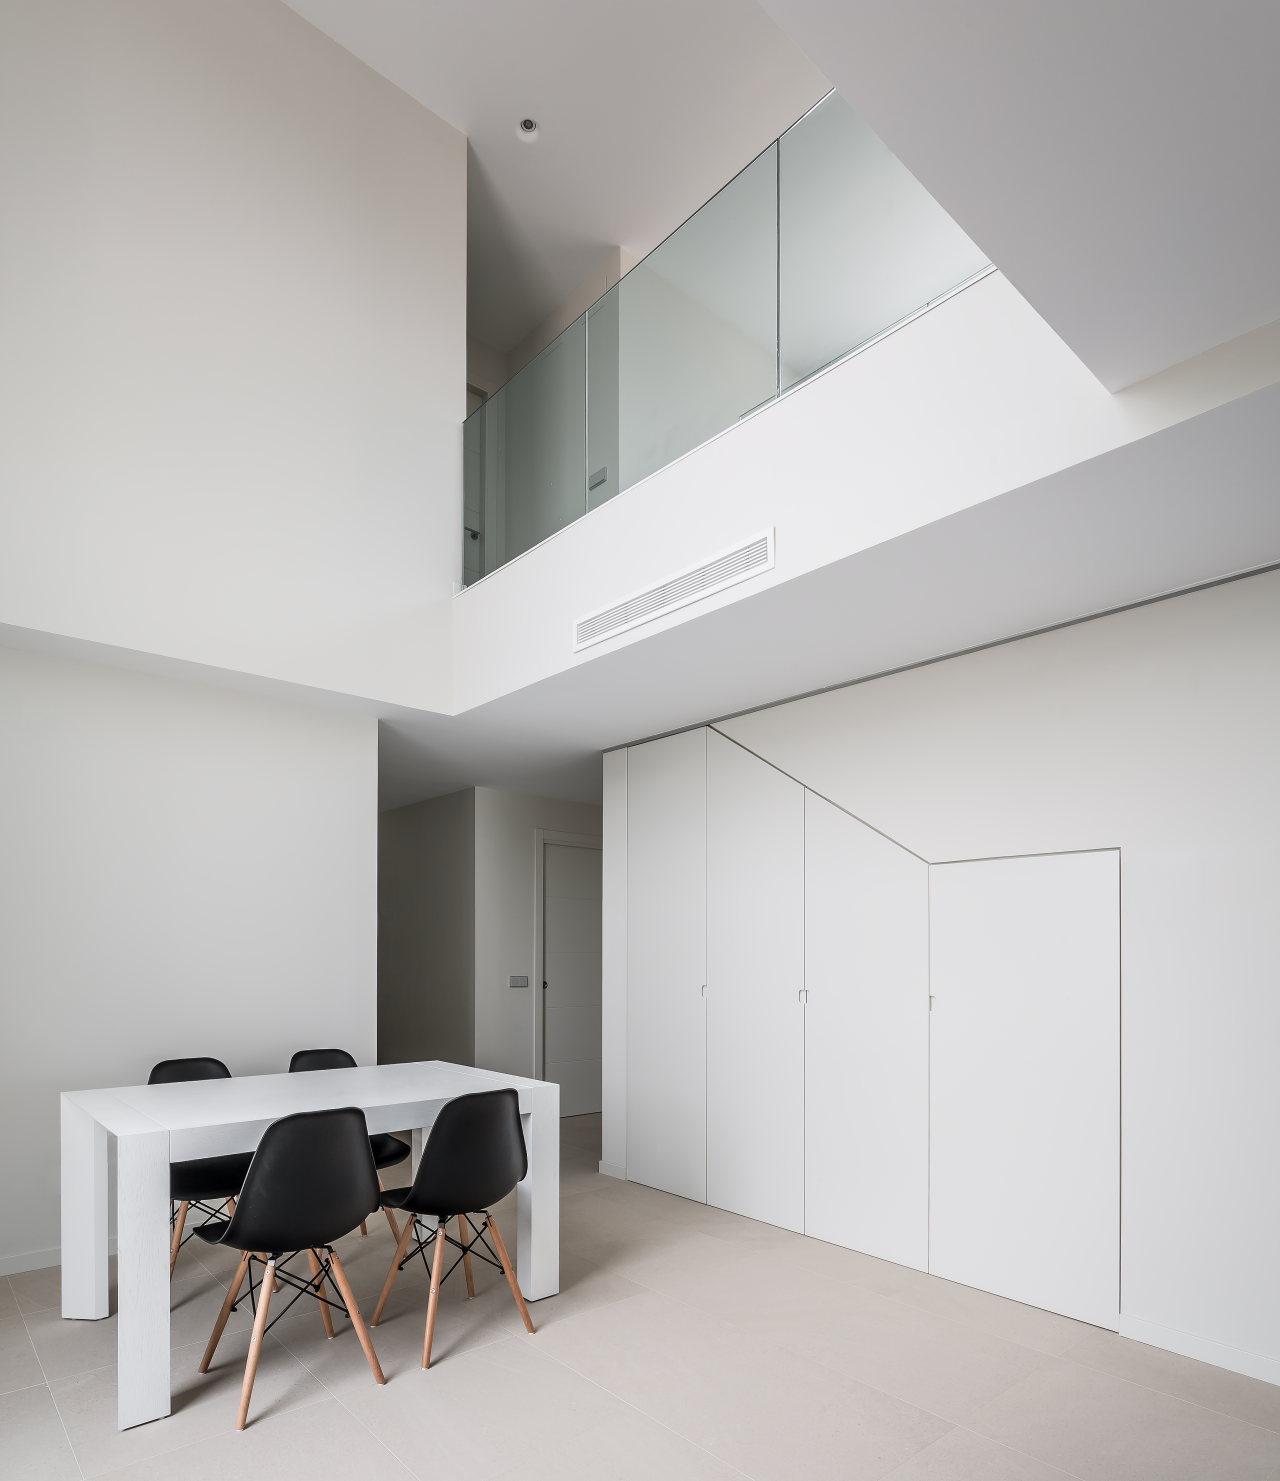 fotografia-arquitectura-valencia-german-cabo-viraje-san-antonio (20)